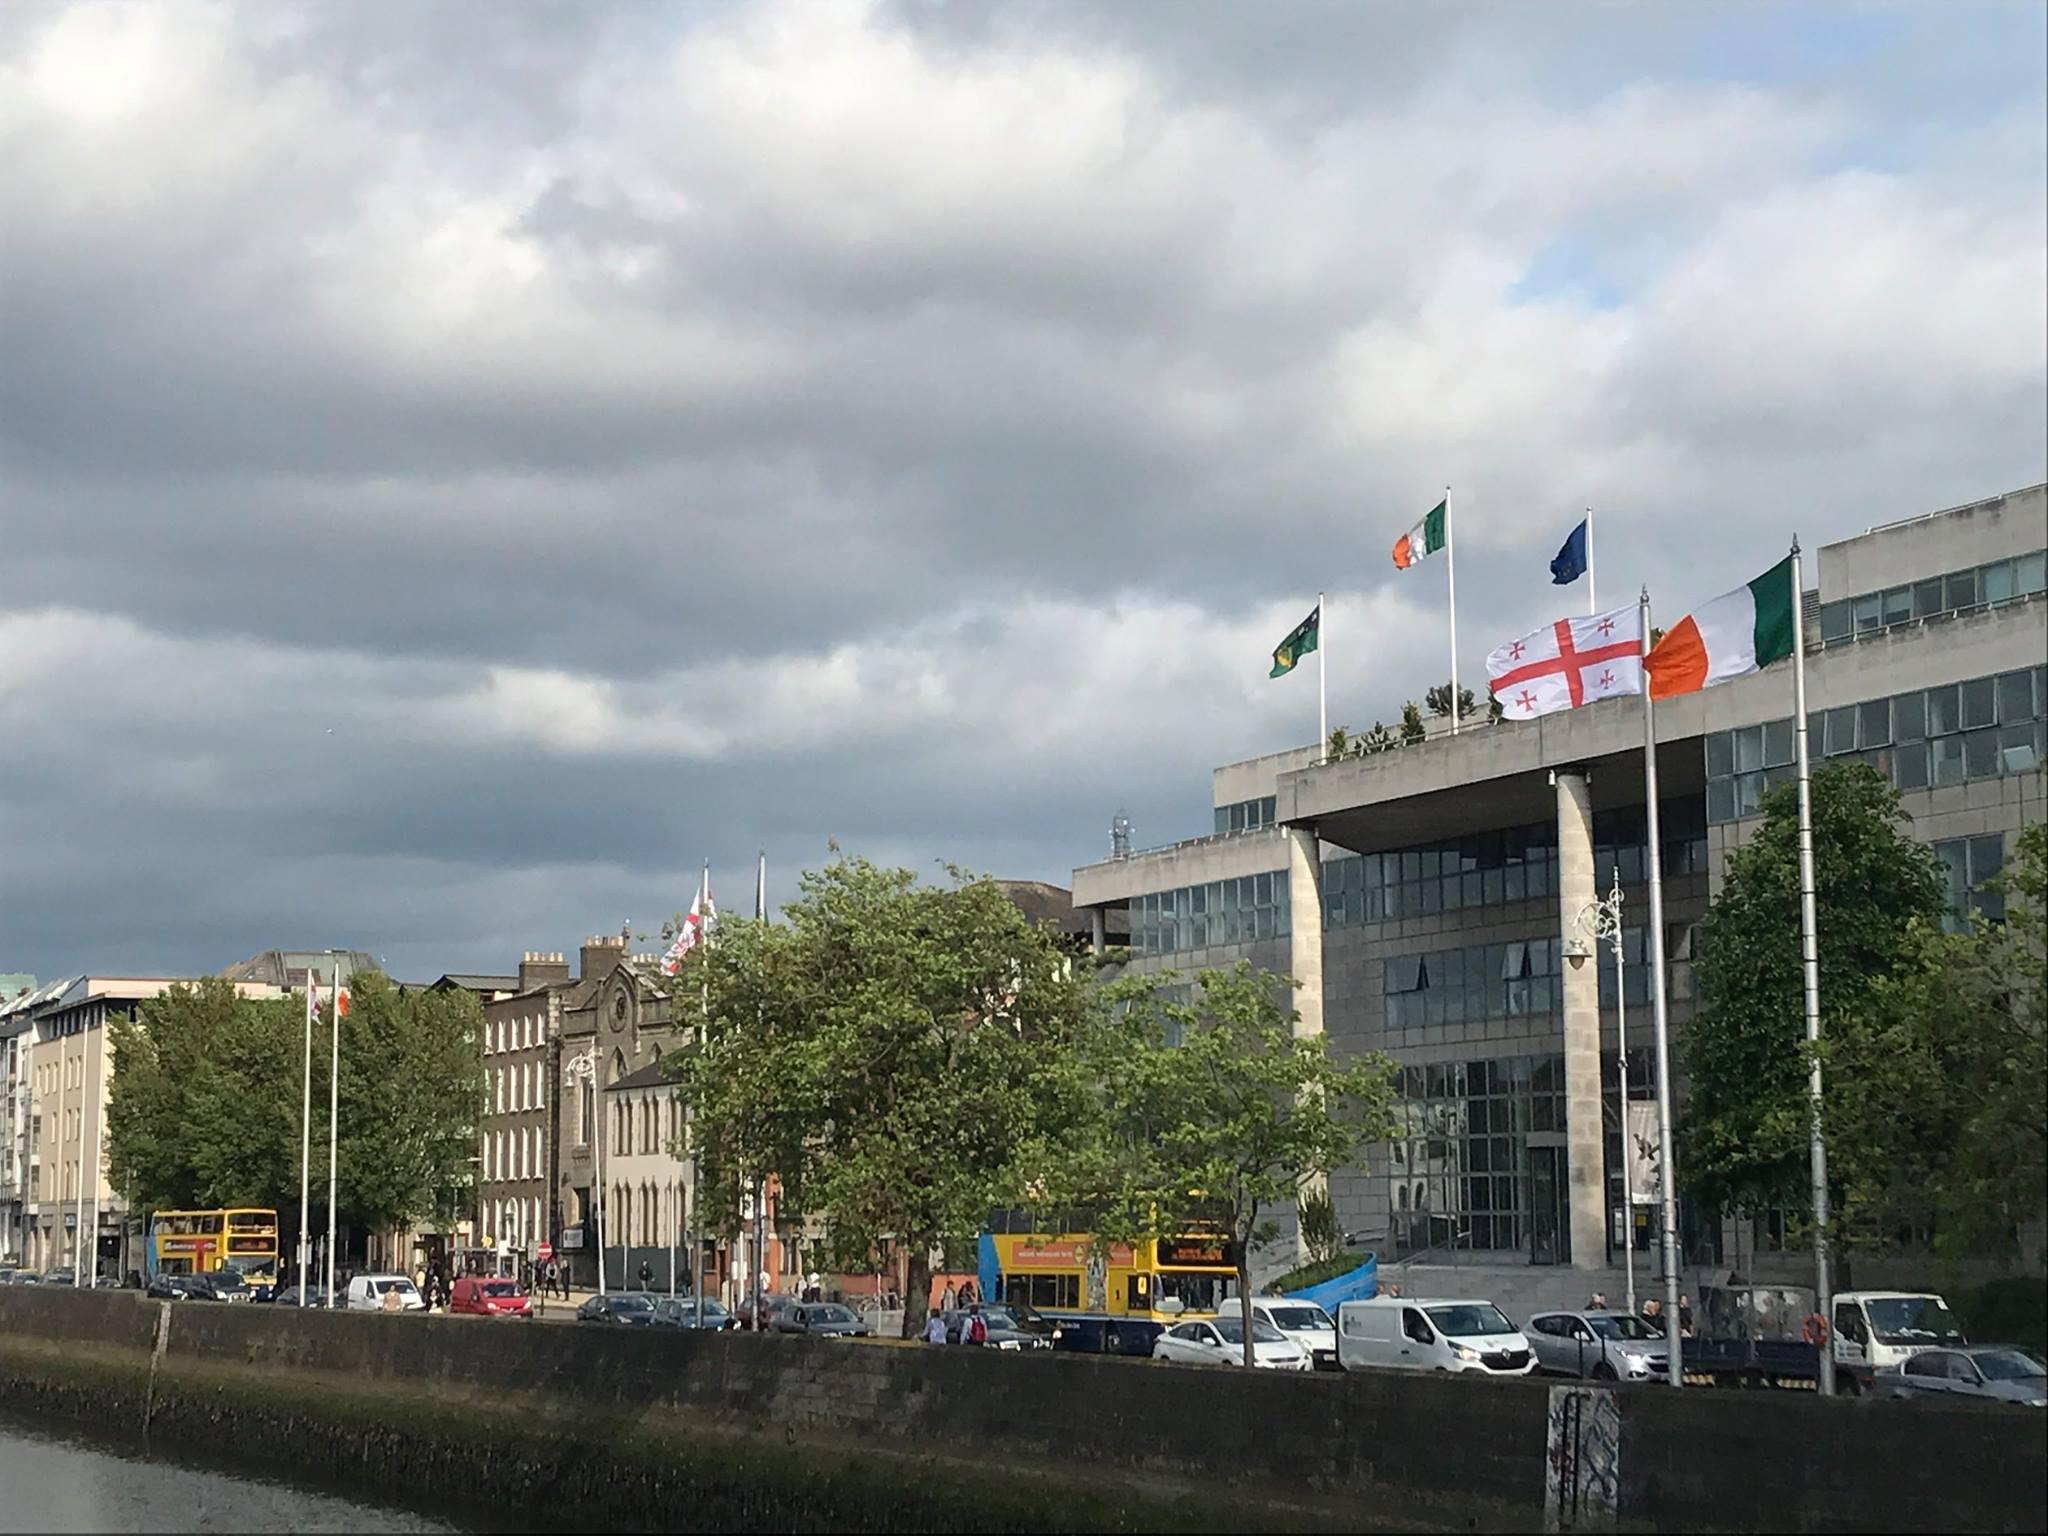 Центр столицы Ирландии украшен флагами Грузии